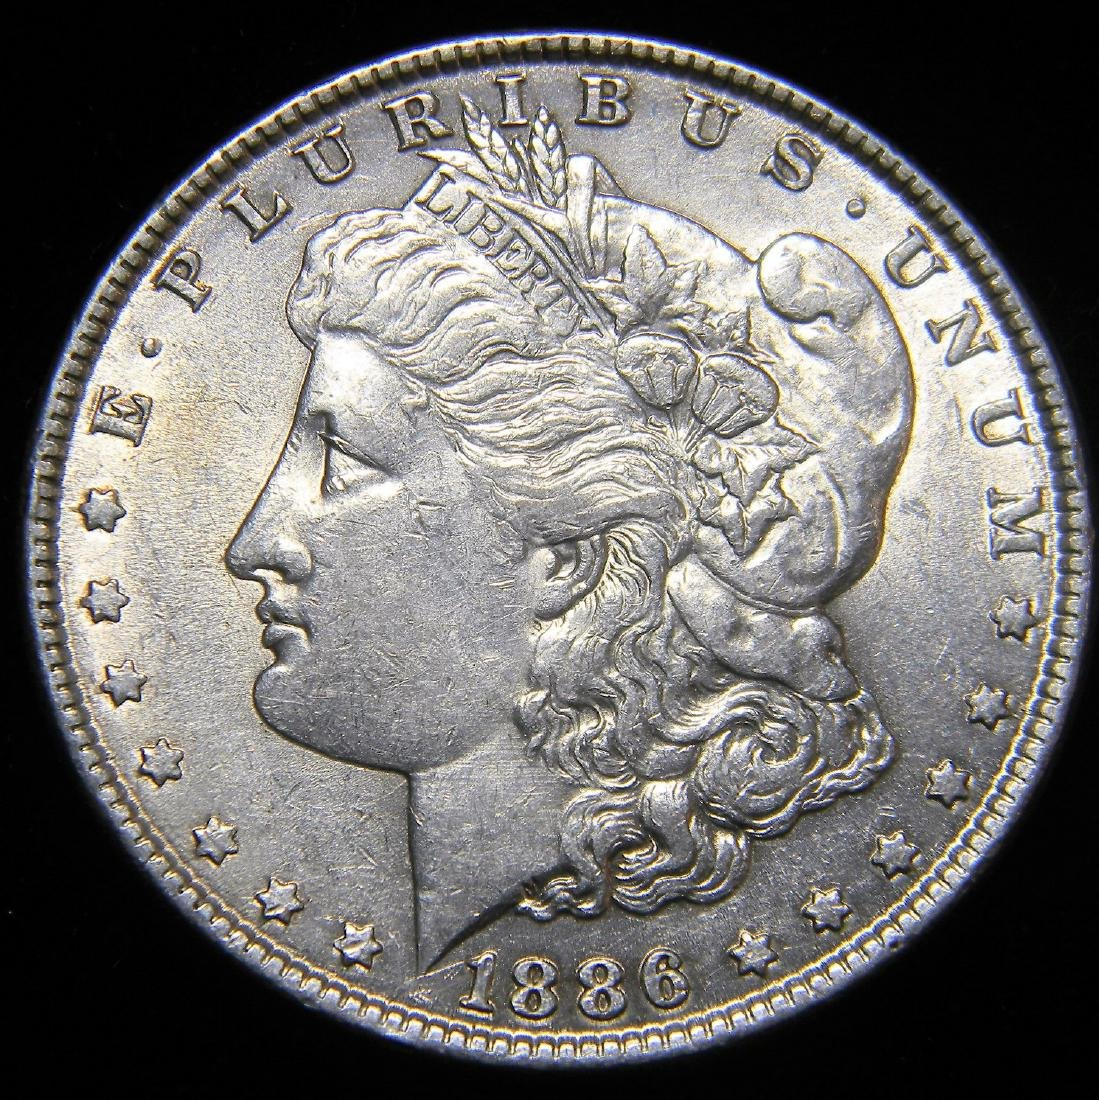 1975 United States Mint Clad Deep Cameo Proof Set